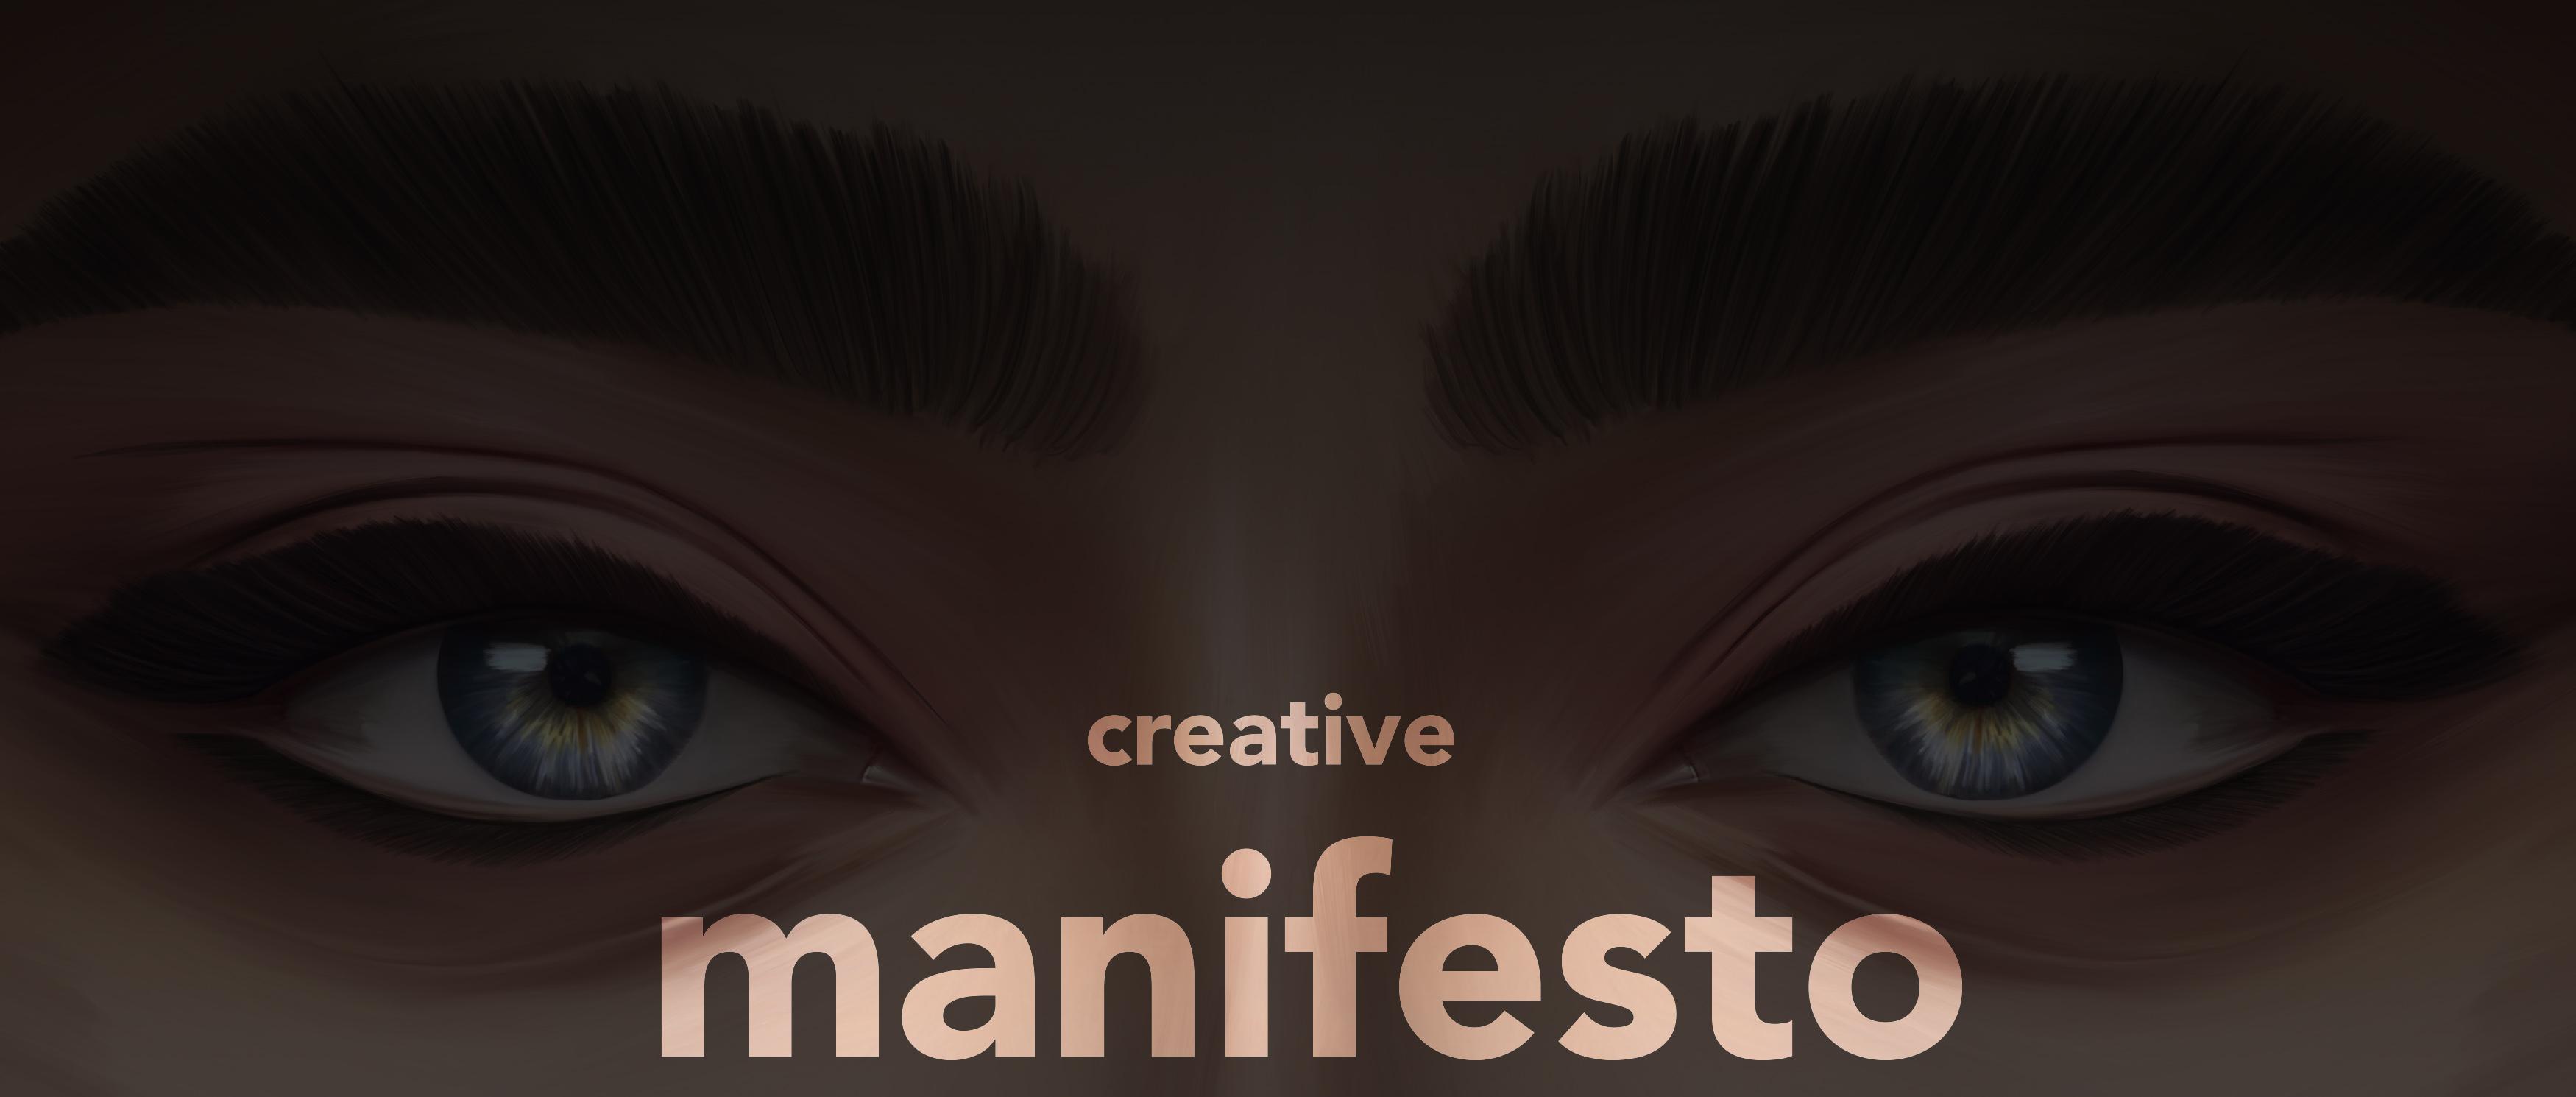 My RØDE Reel 2020 - Creative Manifesto